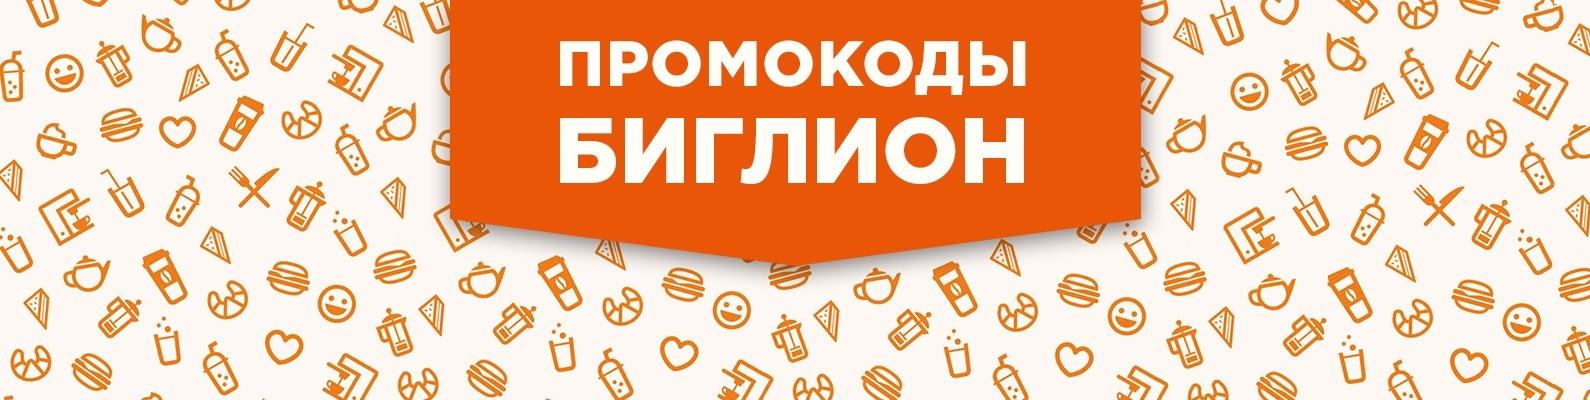 7a564ca6c222e Промокоды Биглион   ВКонтакте